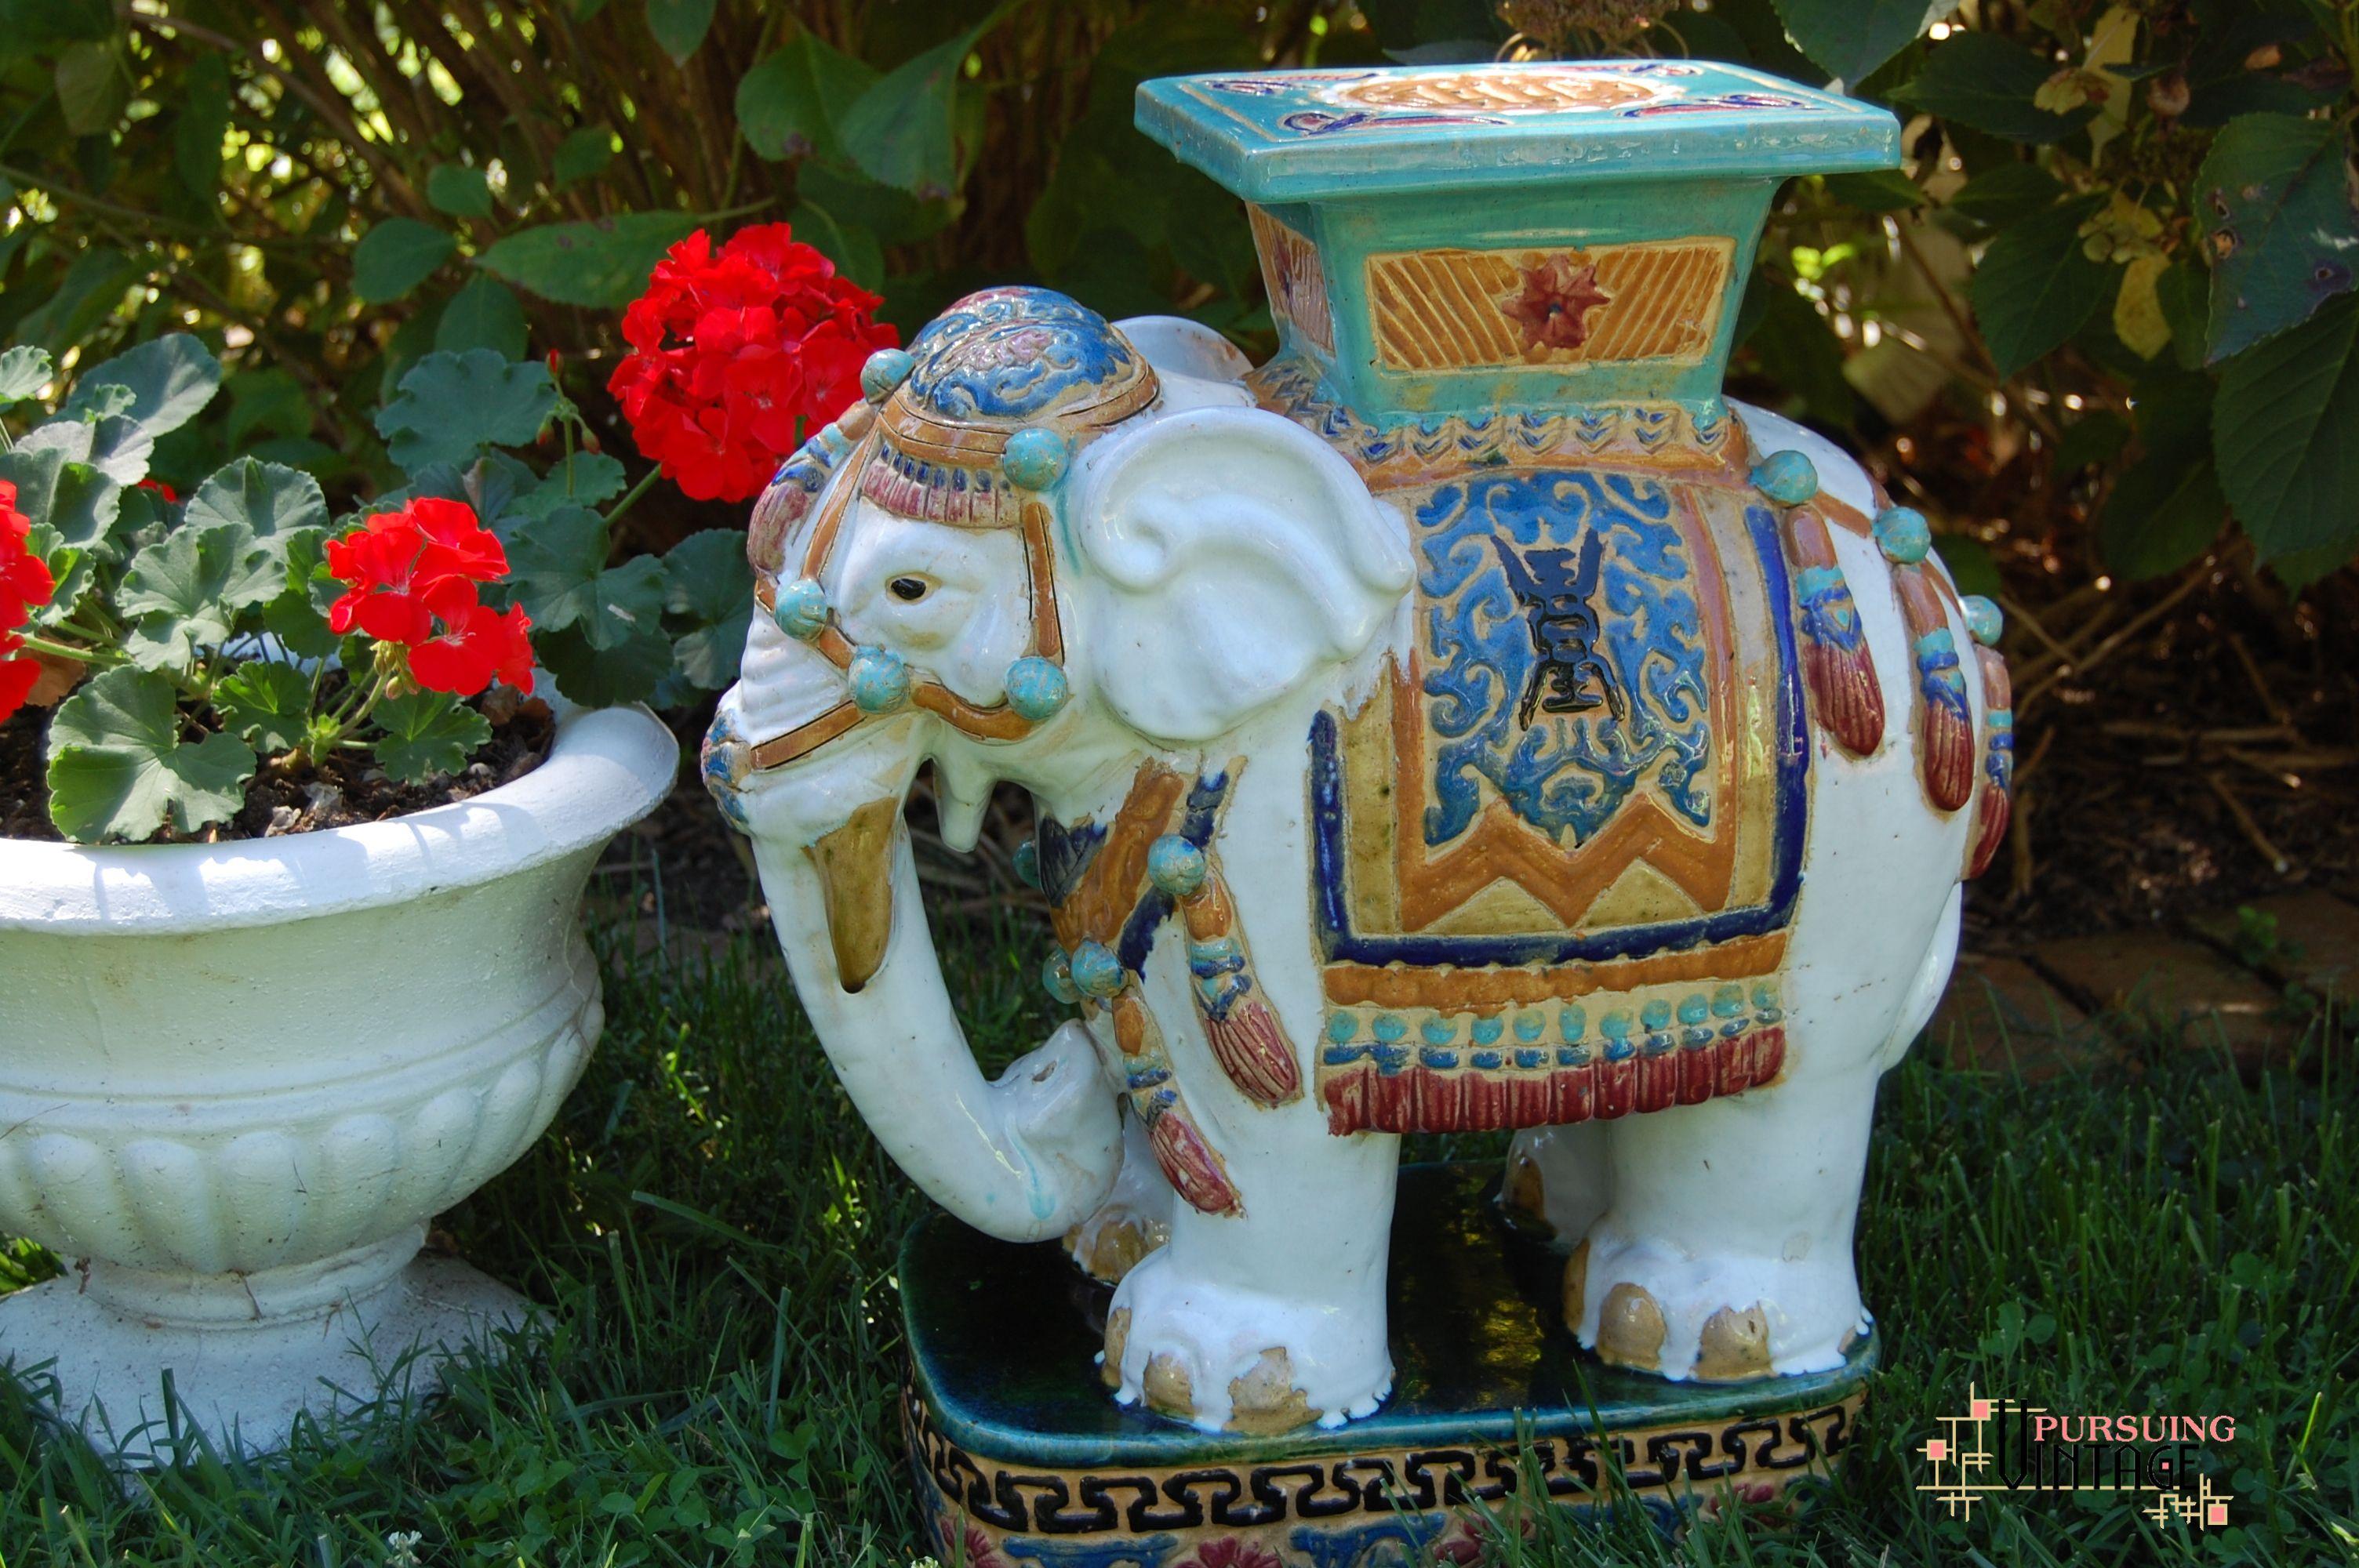 Shop Talk Ceramic Elephant Elephant Asian Garden 640 x 480